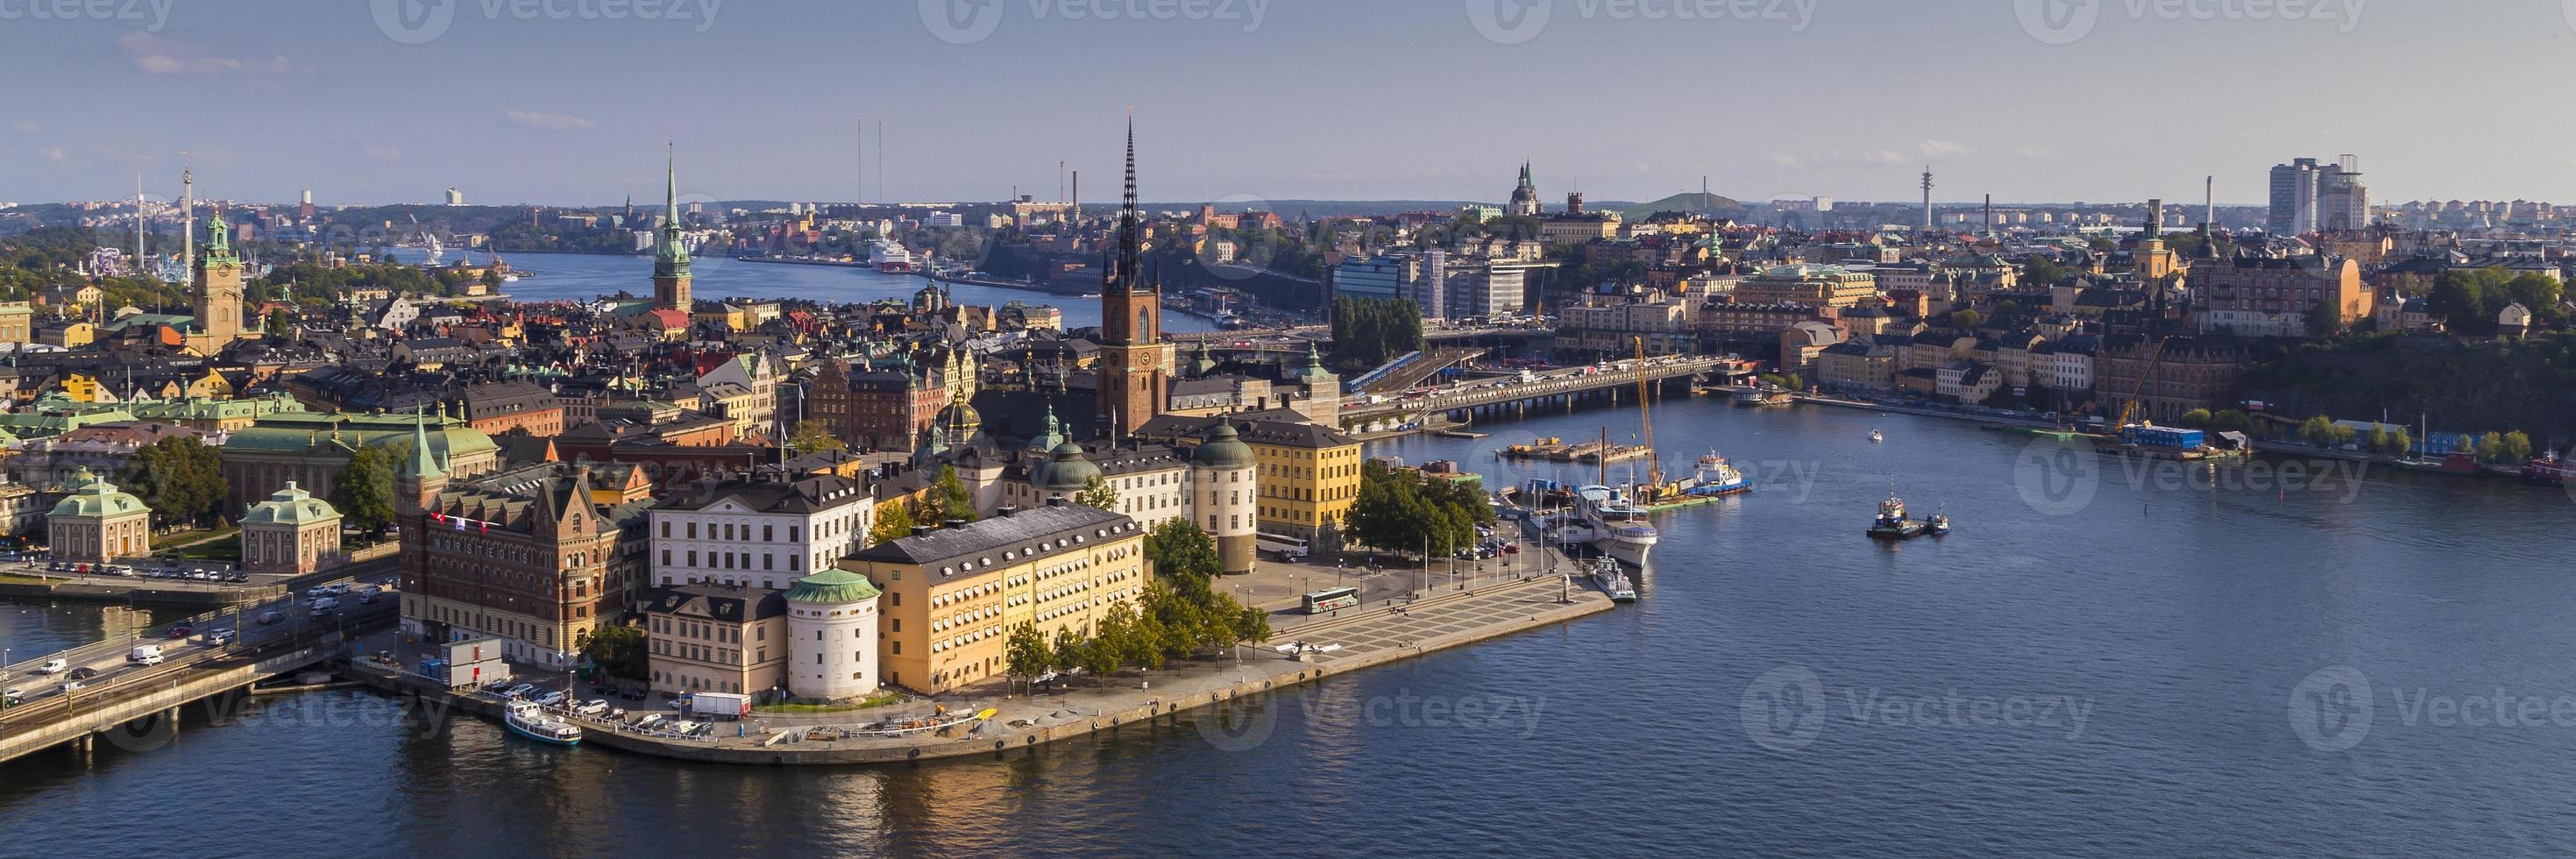 weergave van gamla stan in stockholm foto